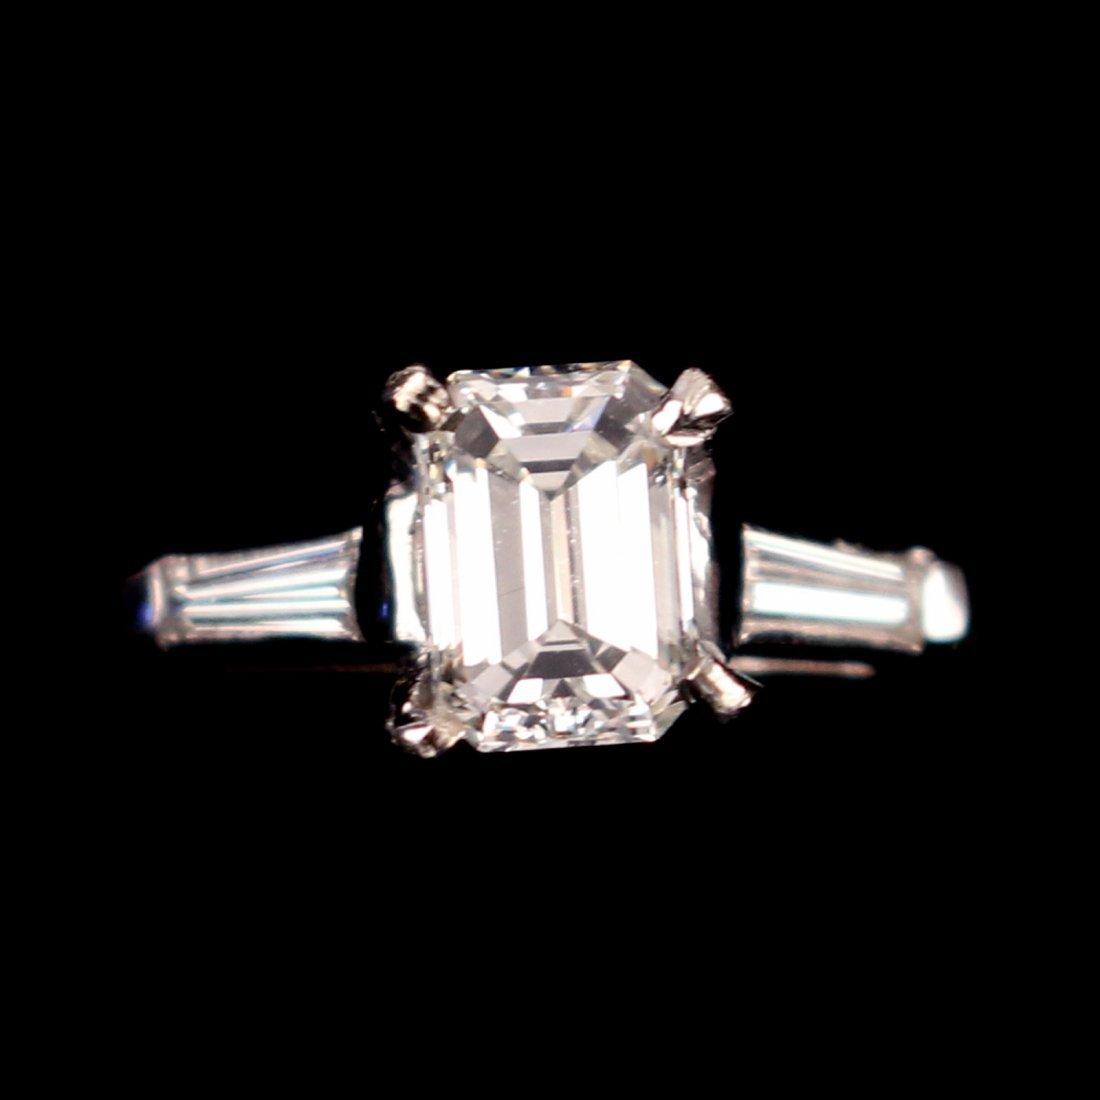 0.83ct EMERALD CUT DIAMOND ENGAGEMENT RING